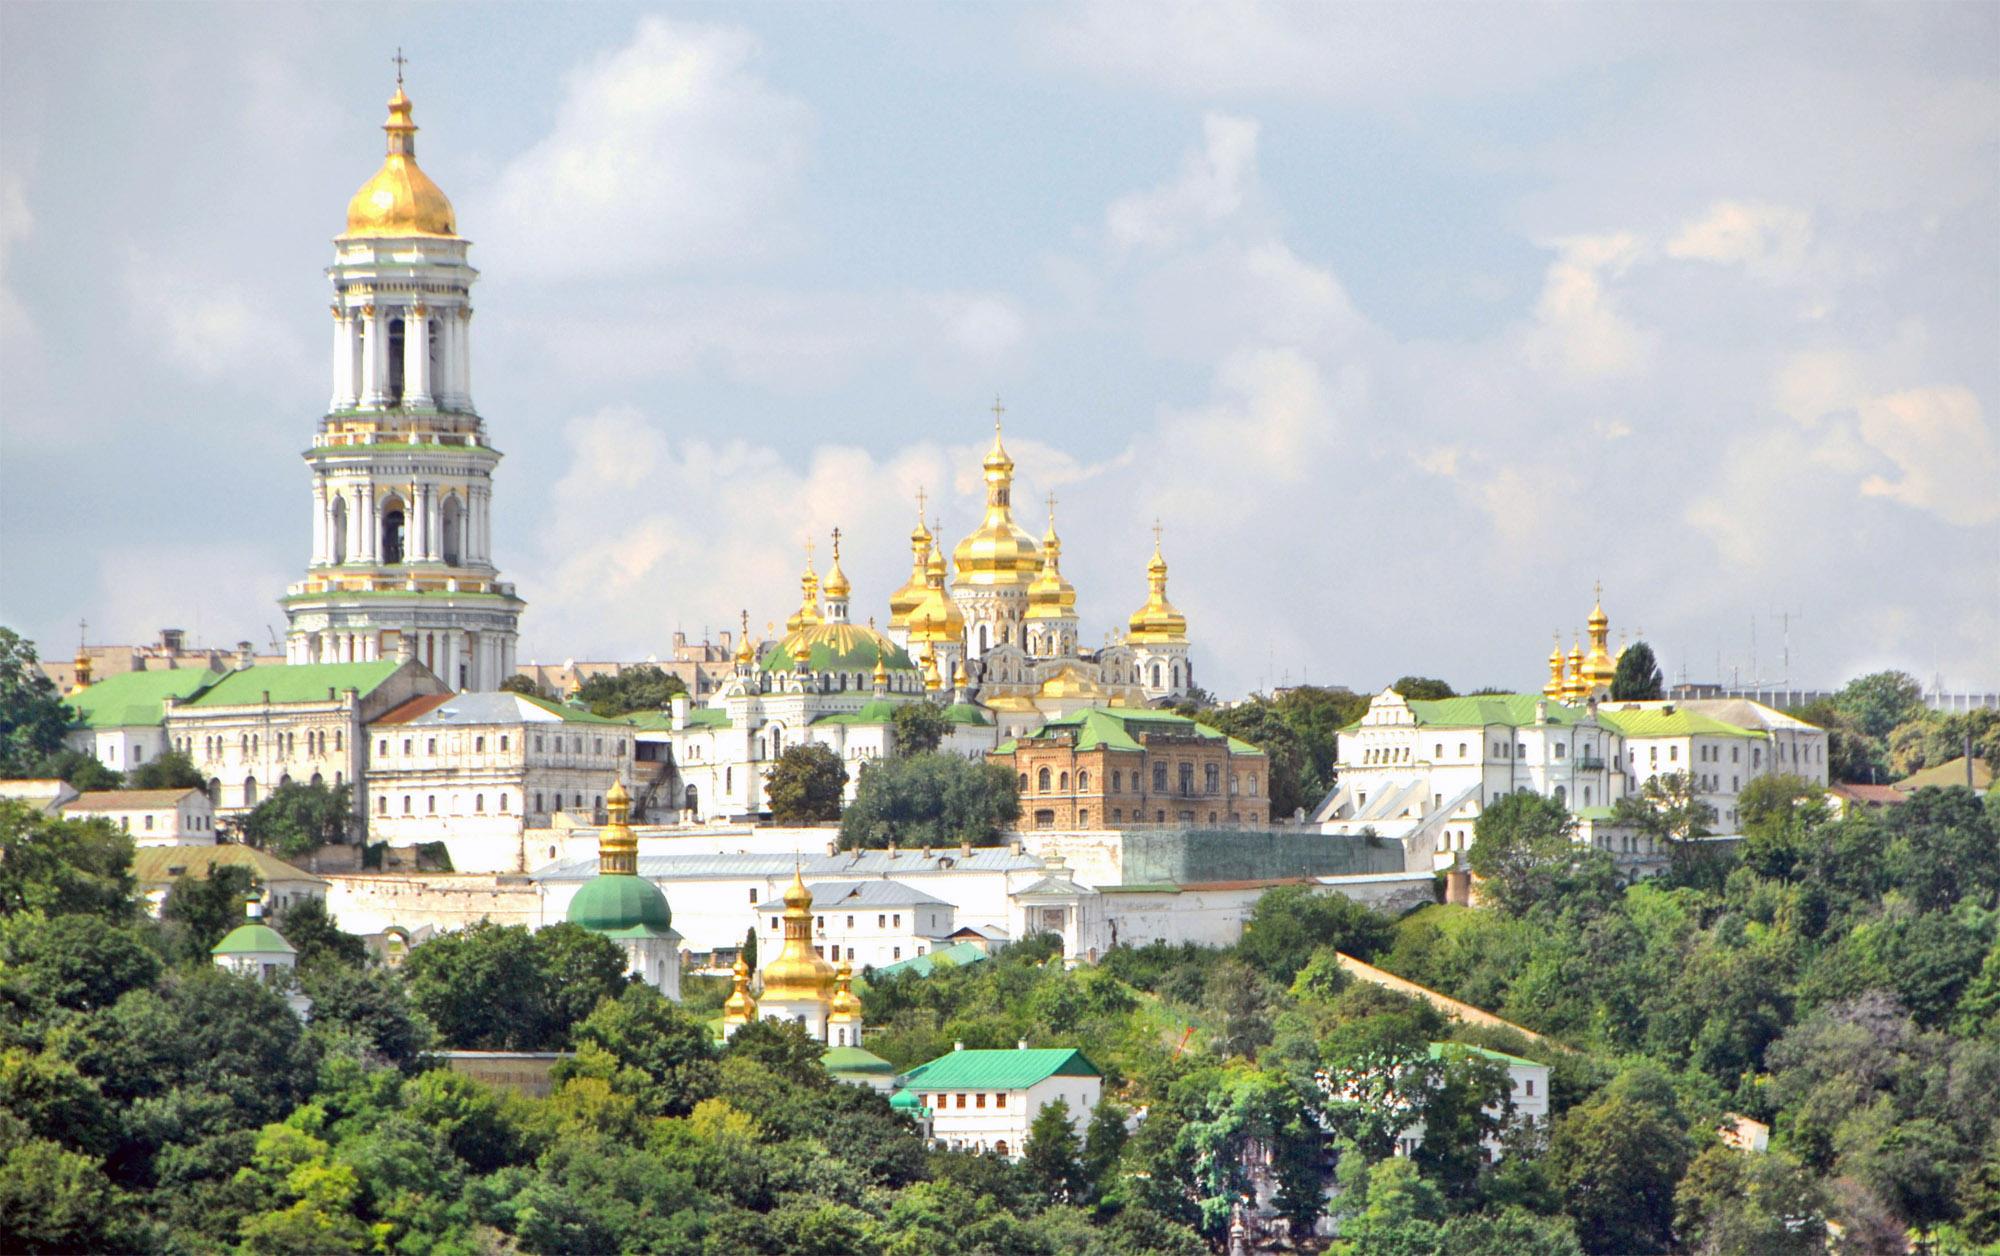 7 предсказание об Украине